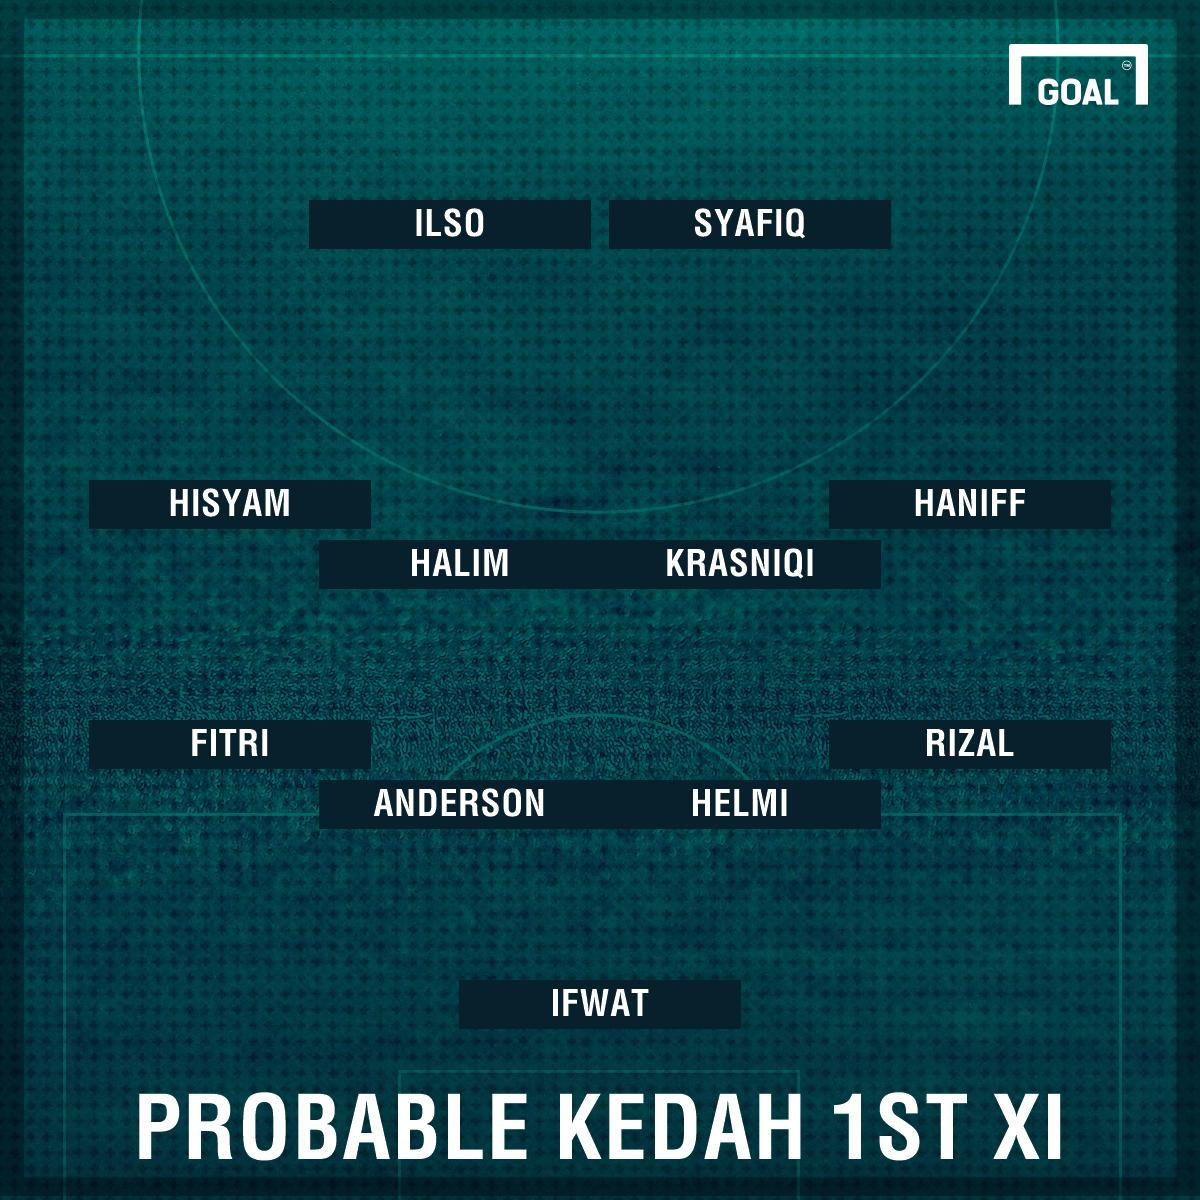 Probable Kedah first XI against Selangor